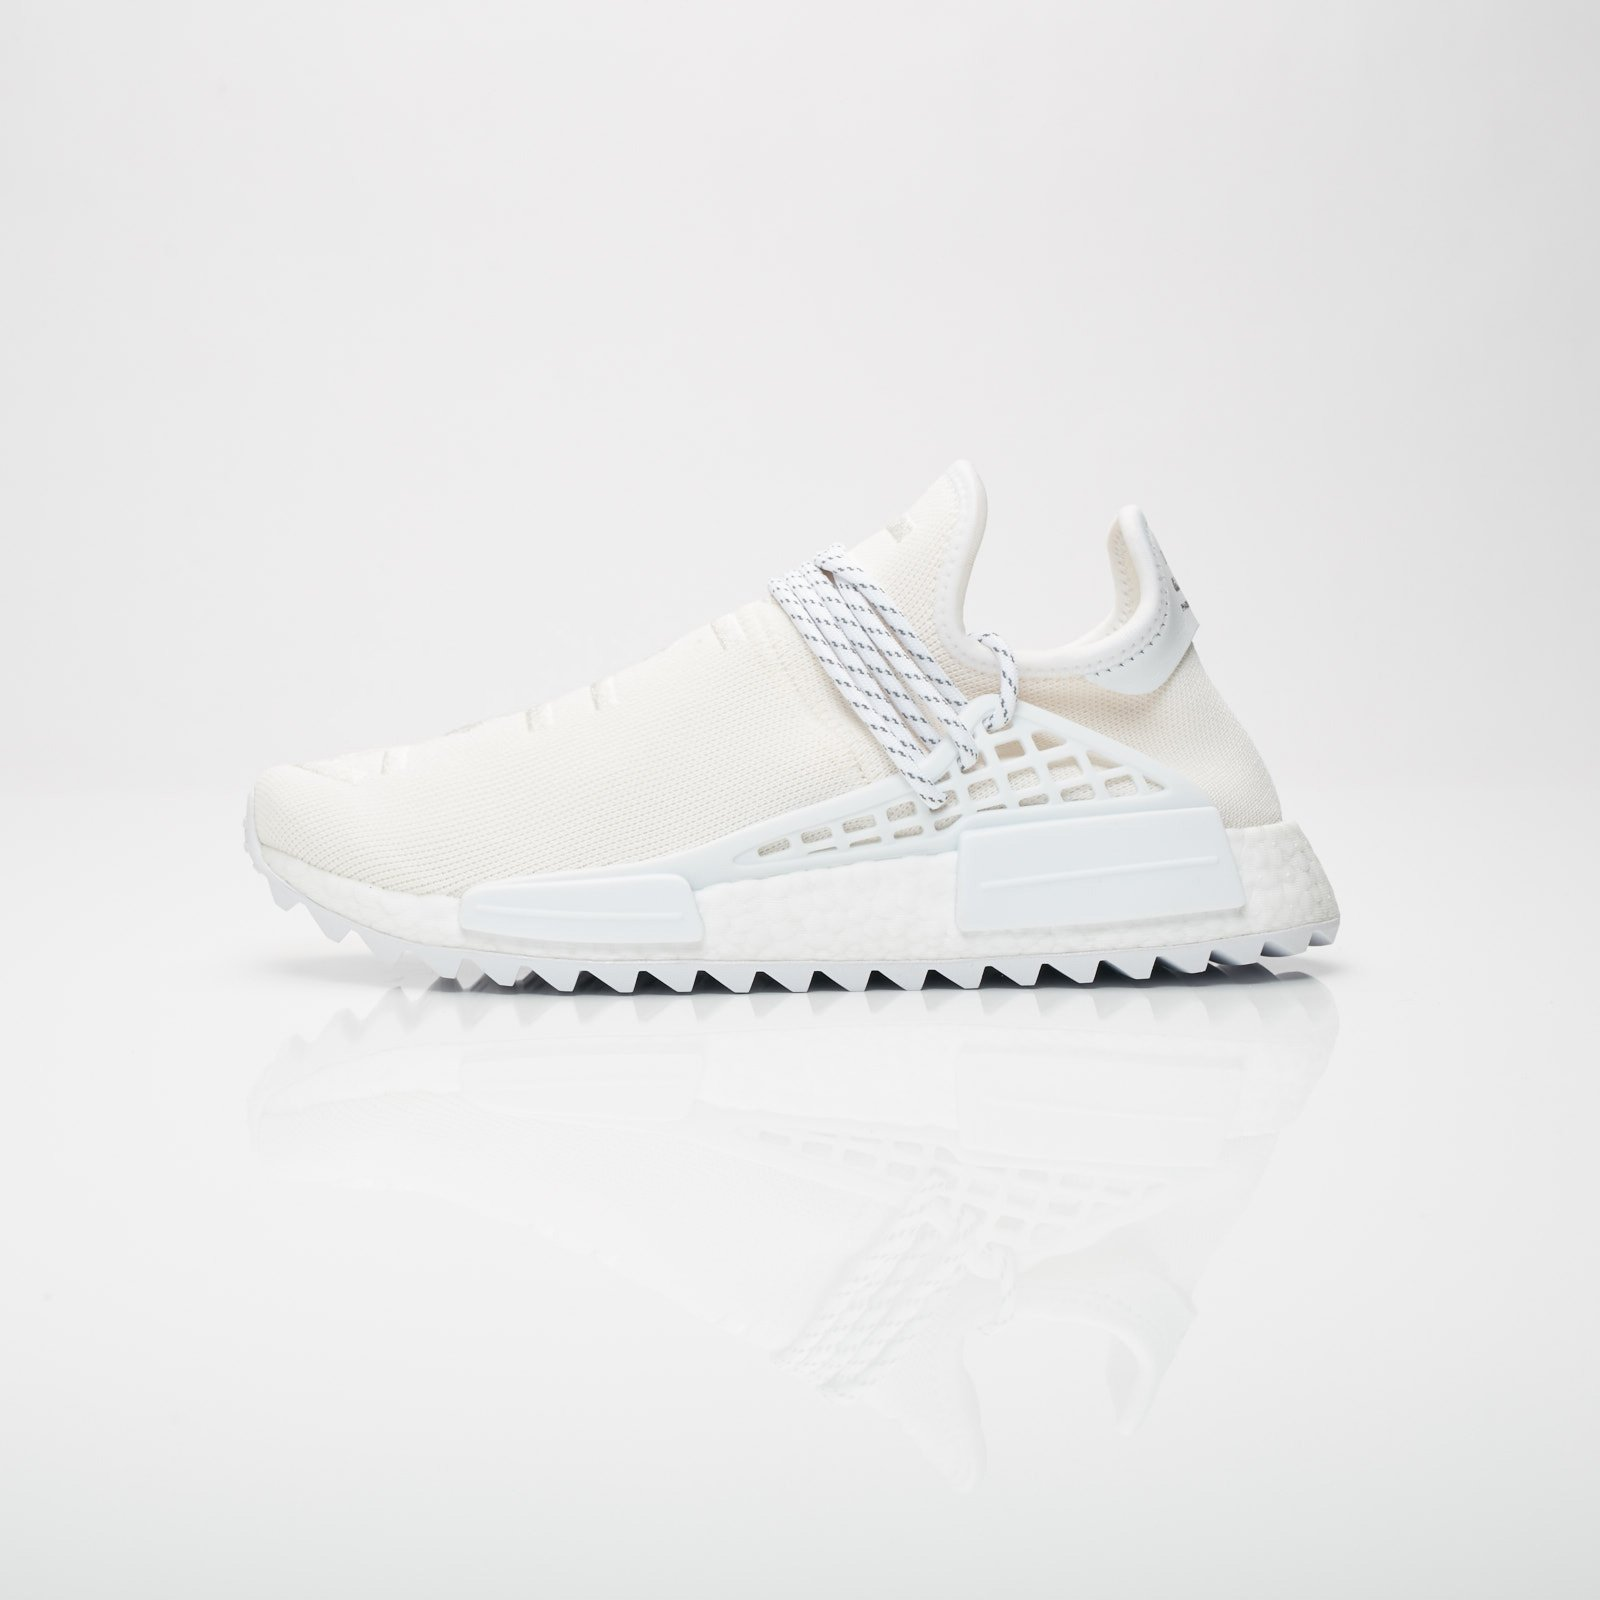 ... adidas Originals Pharrell Williams HU Holi NMD Trail BC ... 9d1e1a3a3